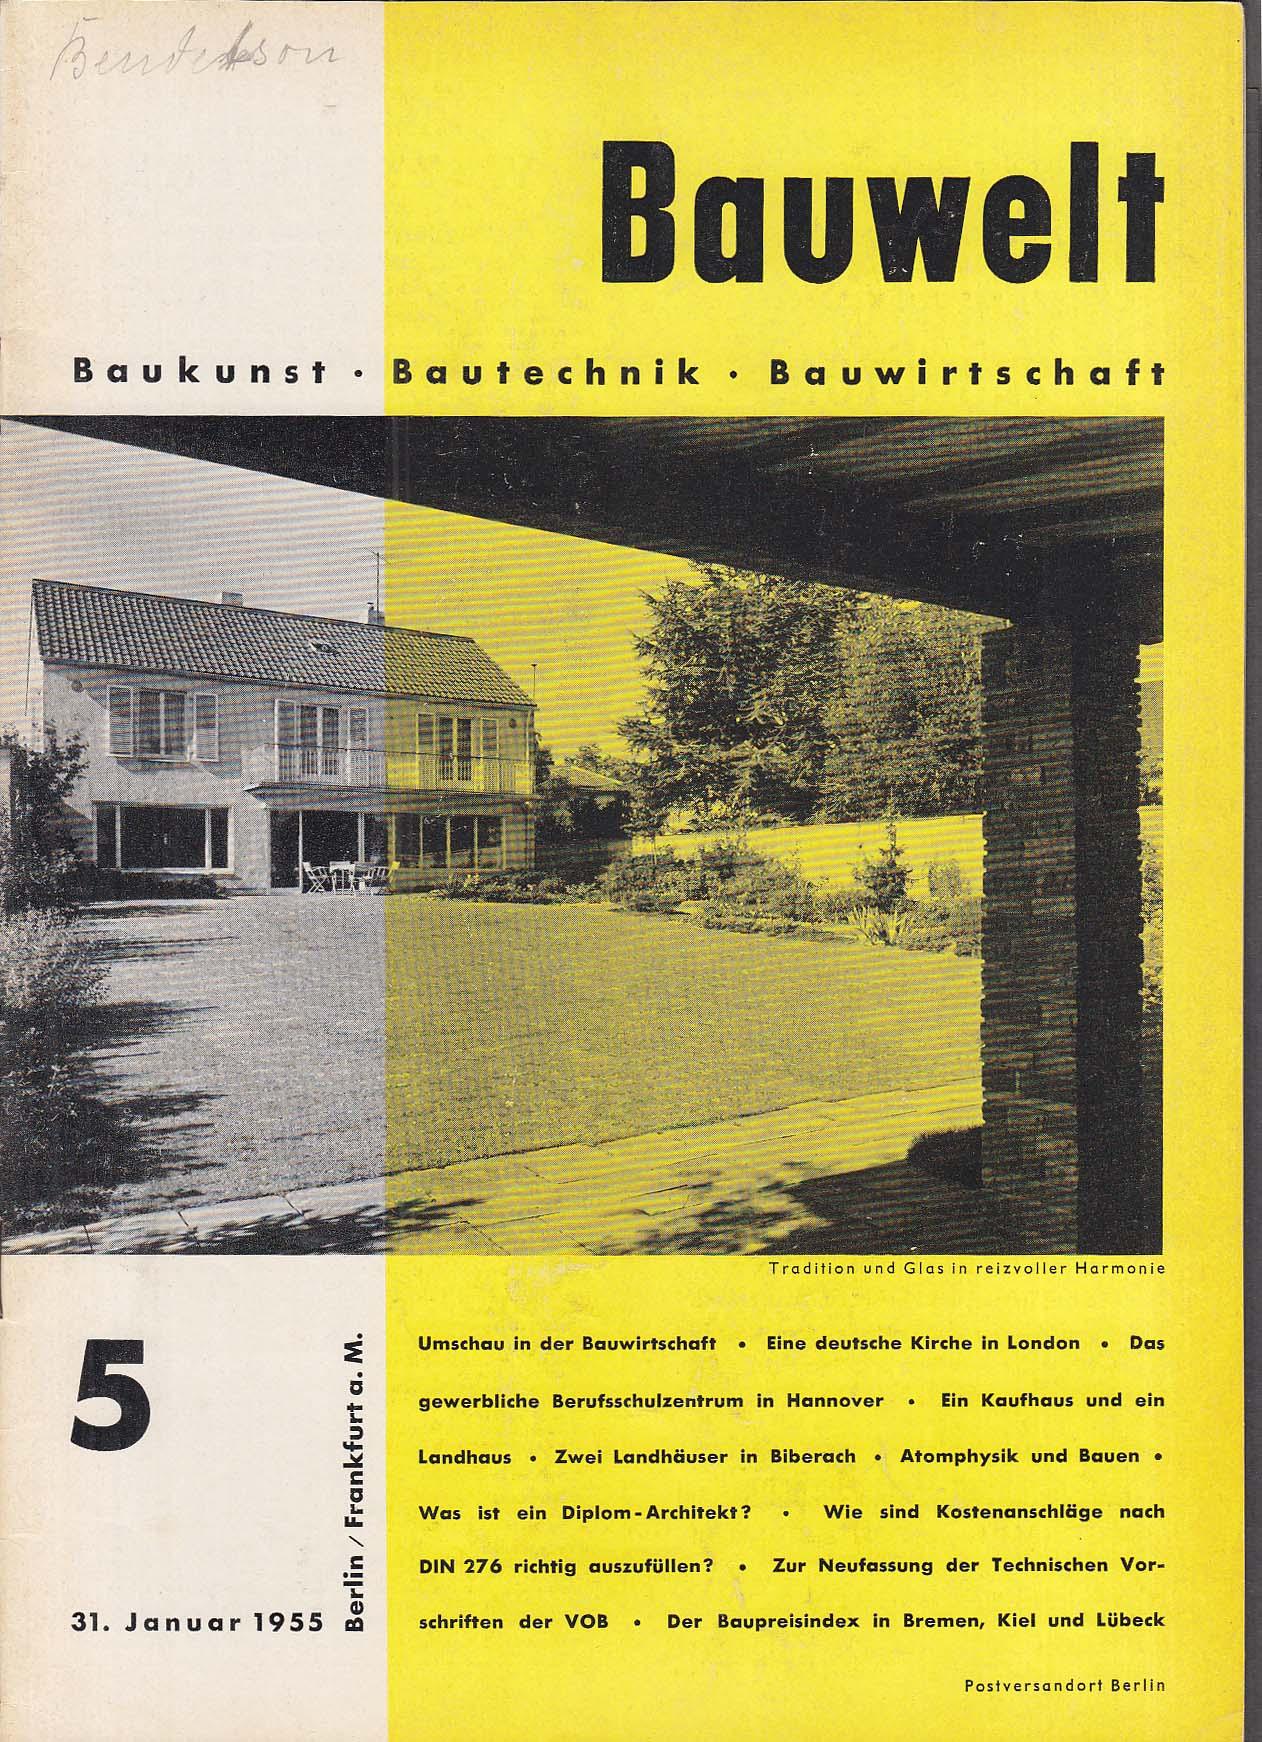 Bauwelt German architecture magazine 1/31/1955 5